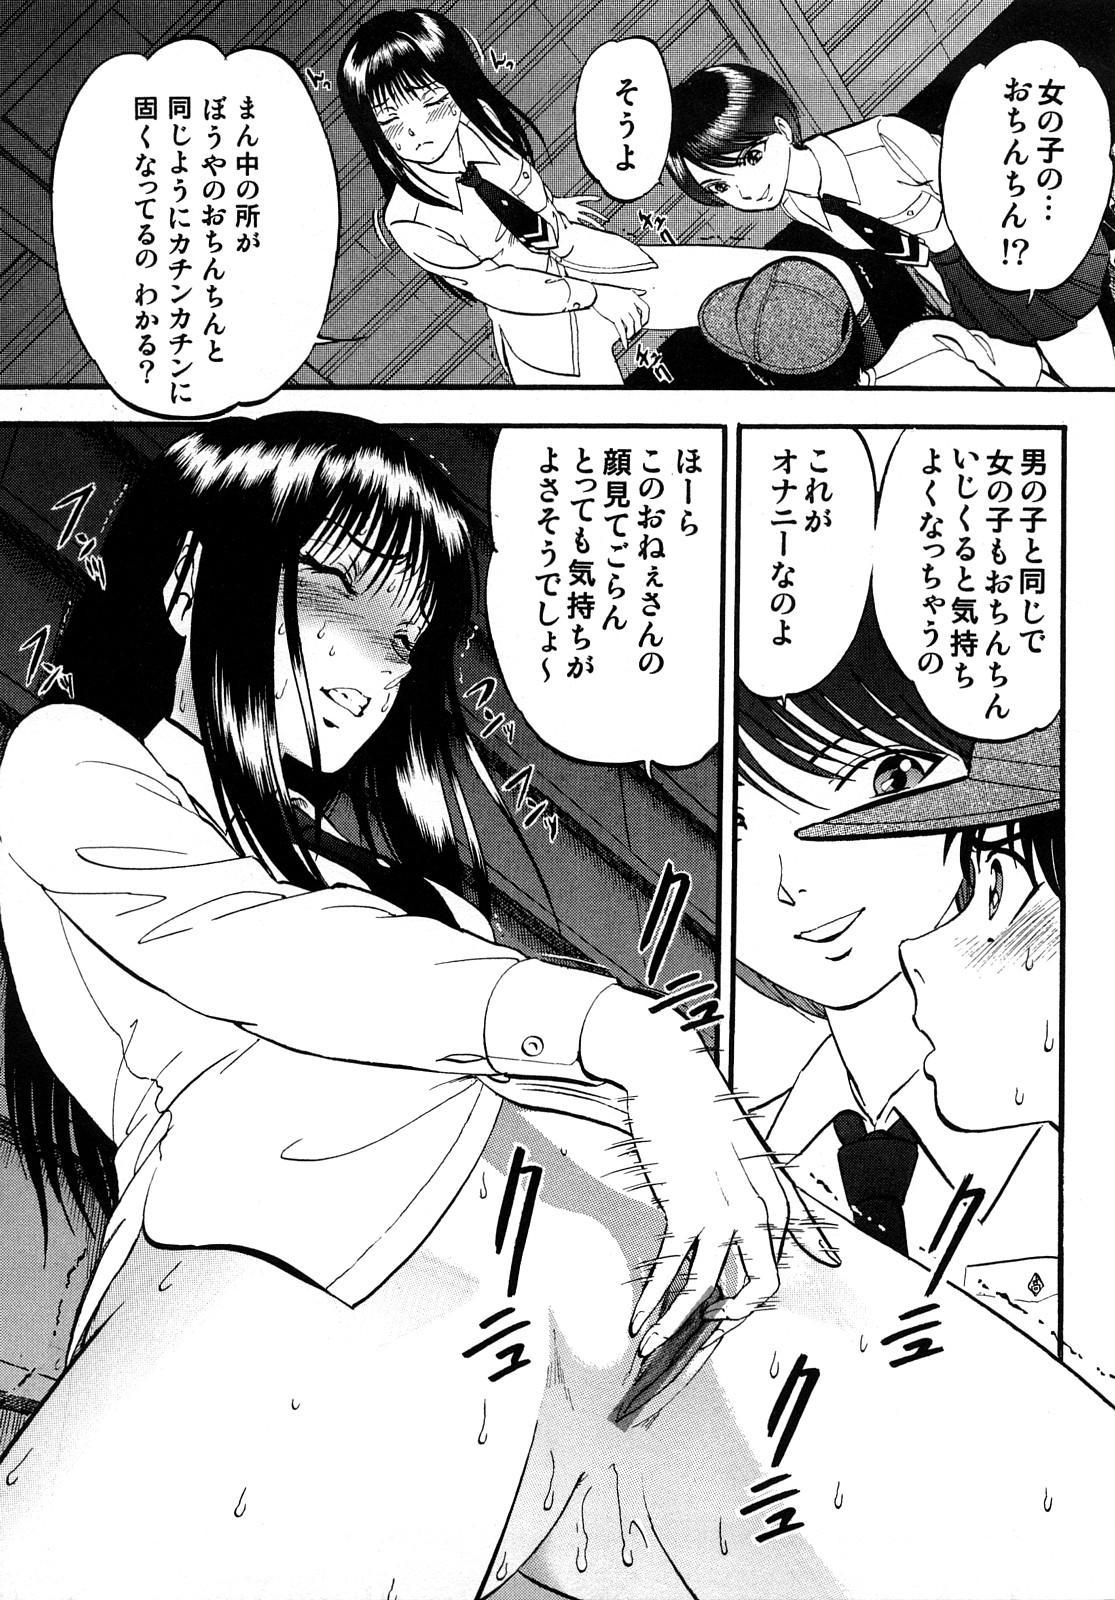 R Shitei Jou 170